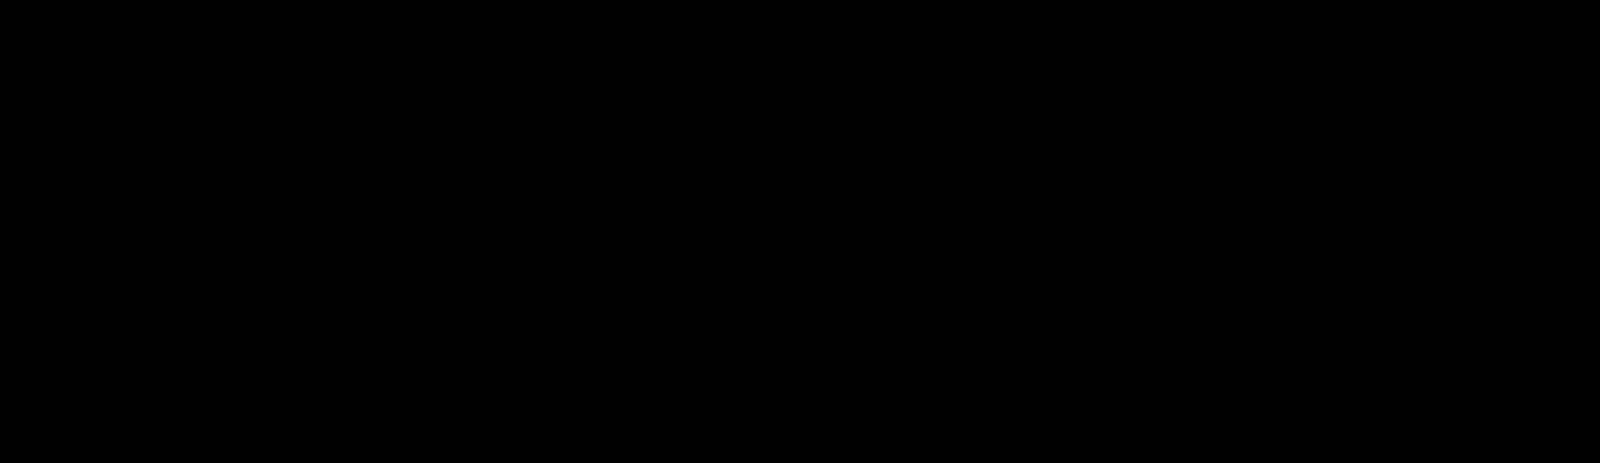 itunes logo 4 - iTunes Logo